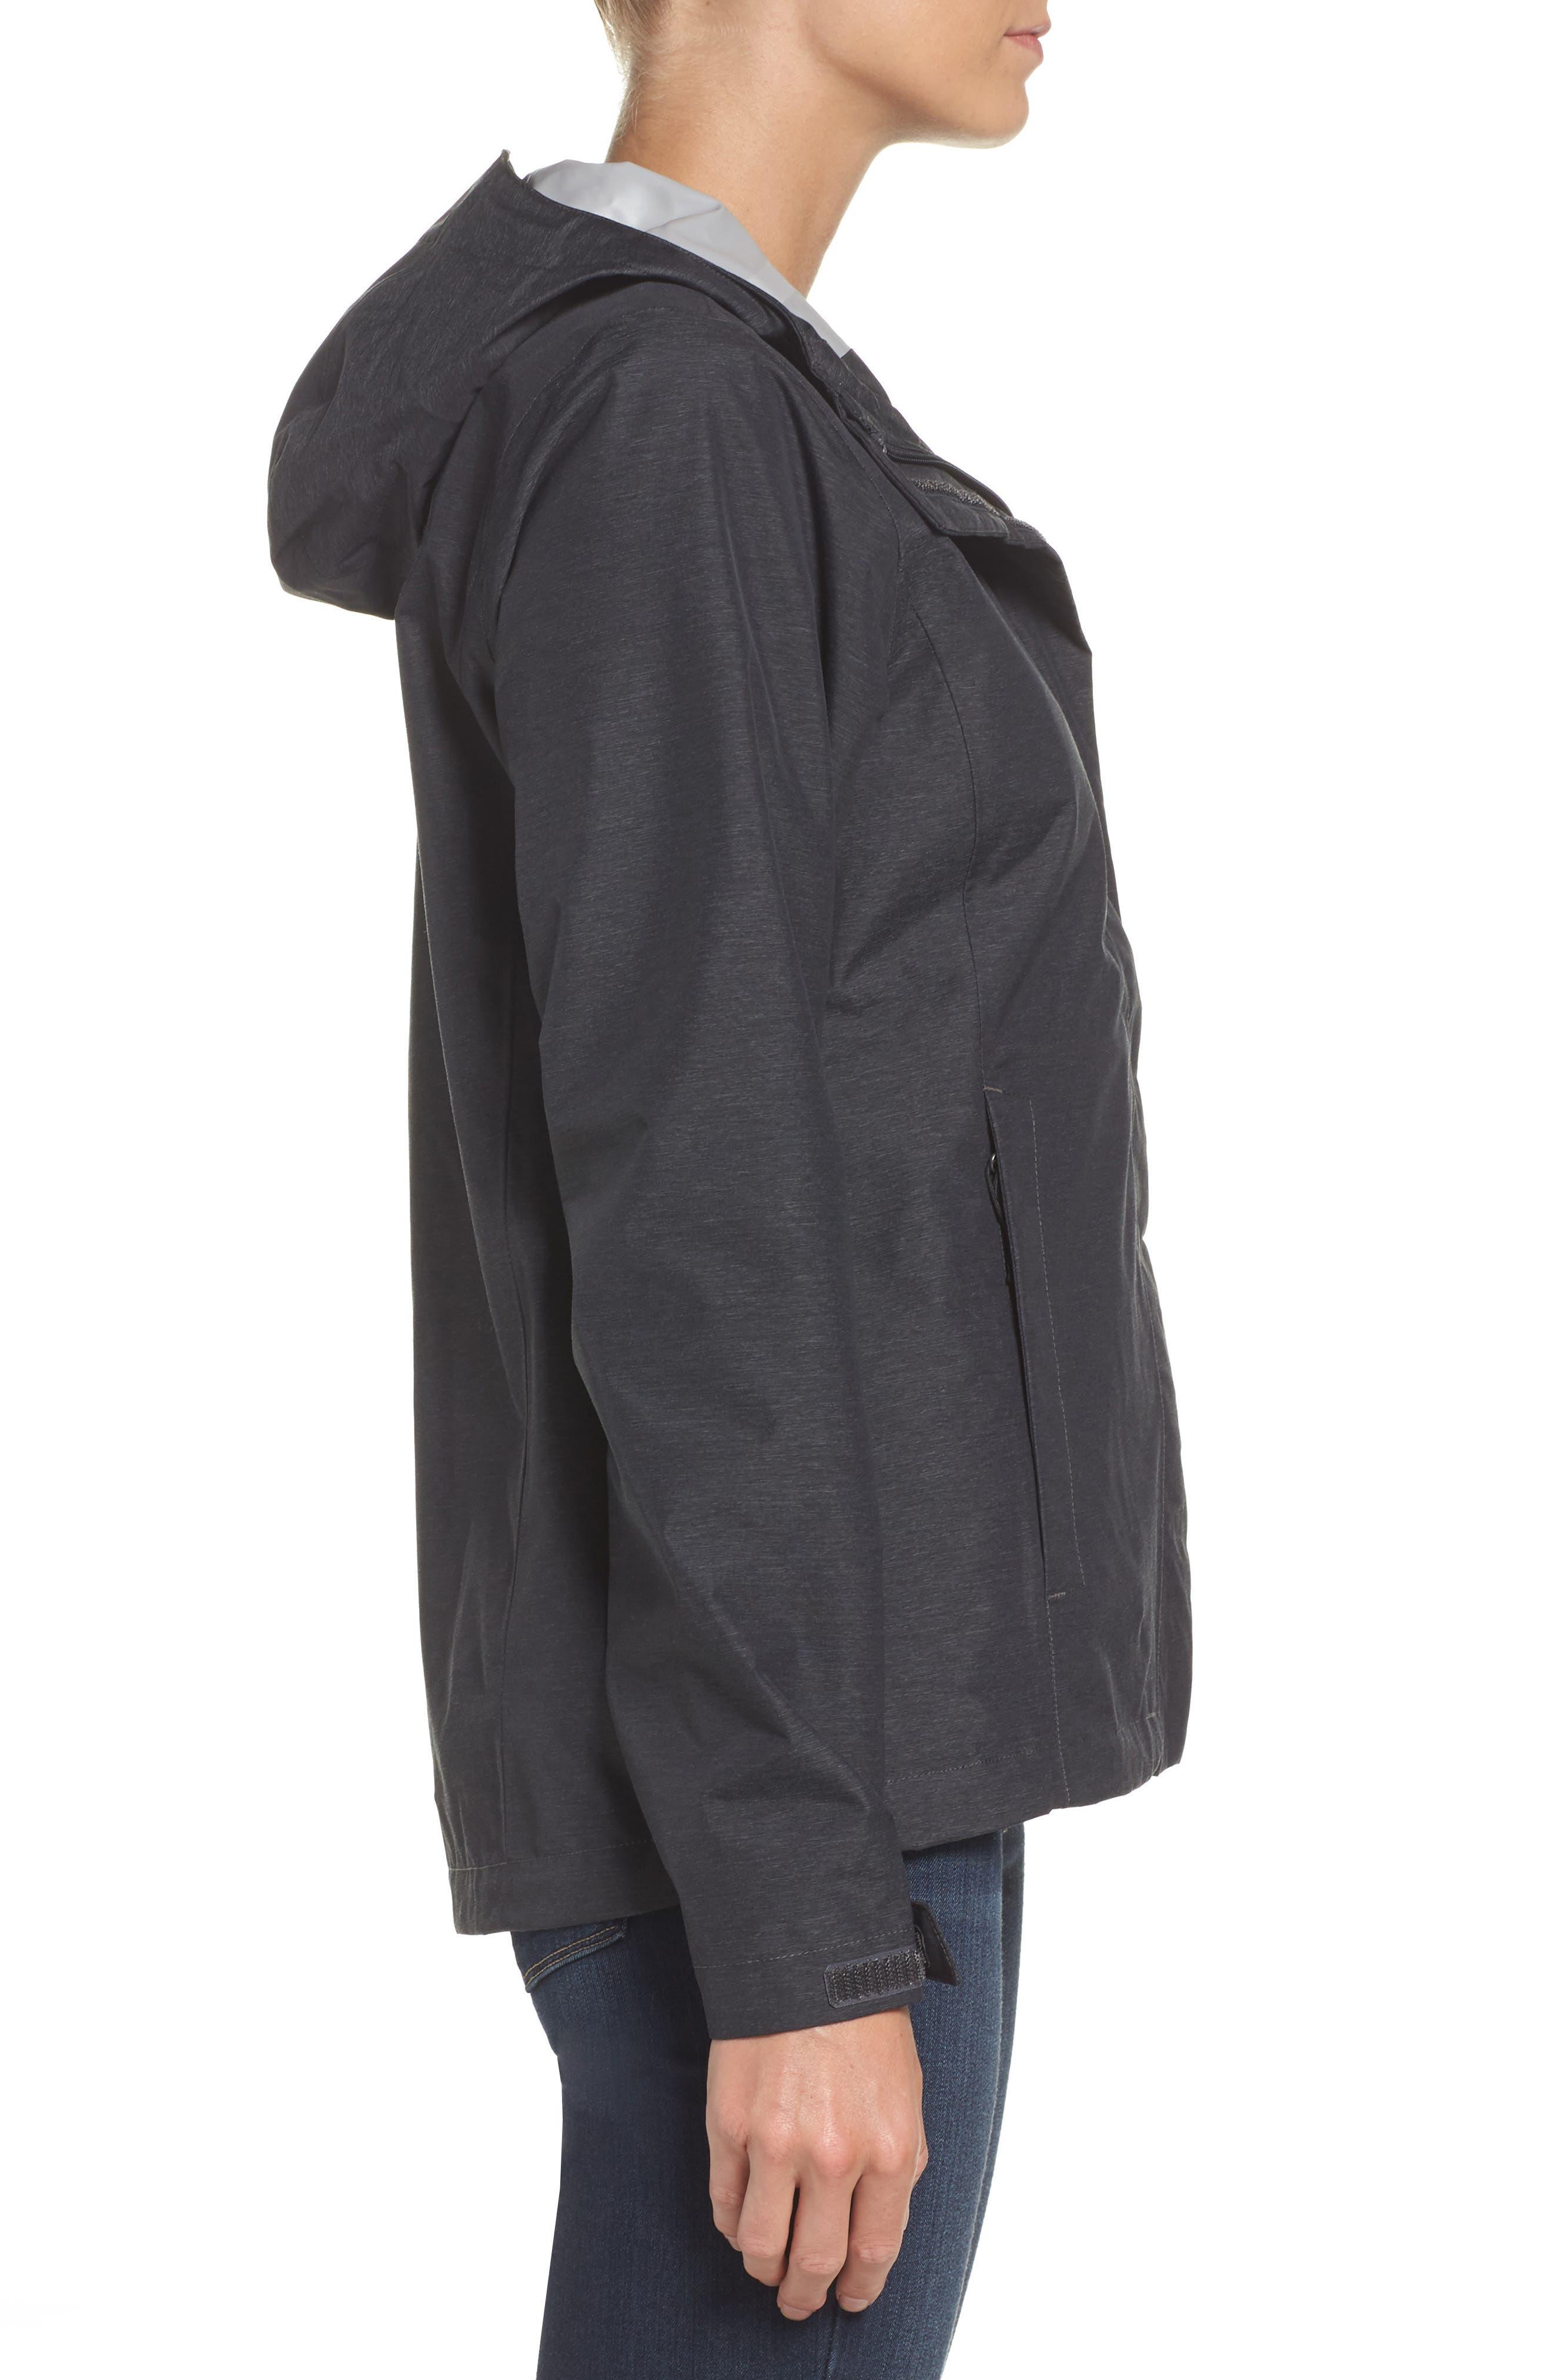 Venture 2 Waterproof Jacket,                             Alternate thumbnail 3, color,                             TNF DARK GREY HEATHER